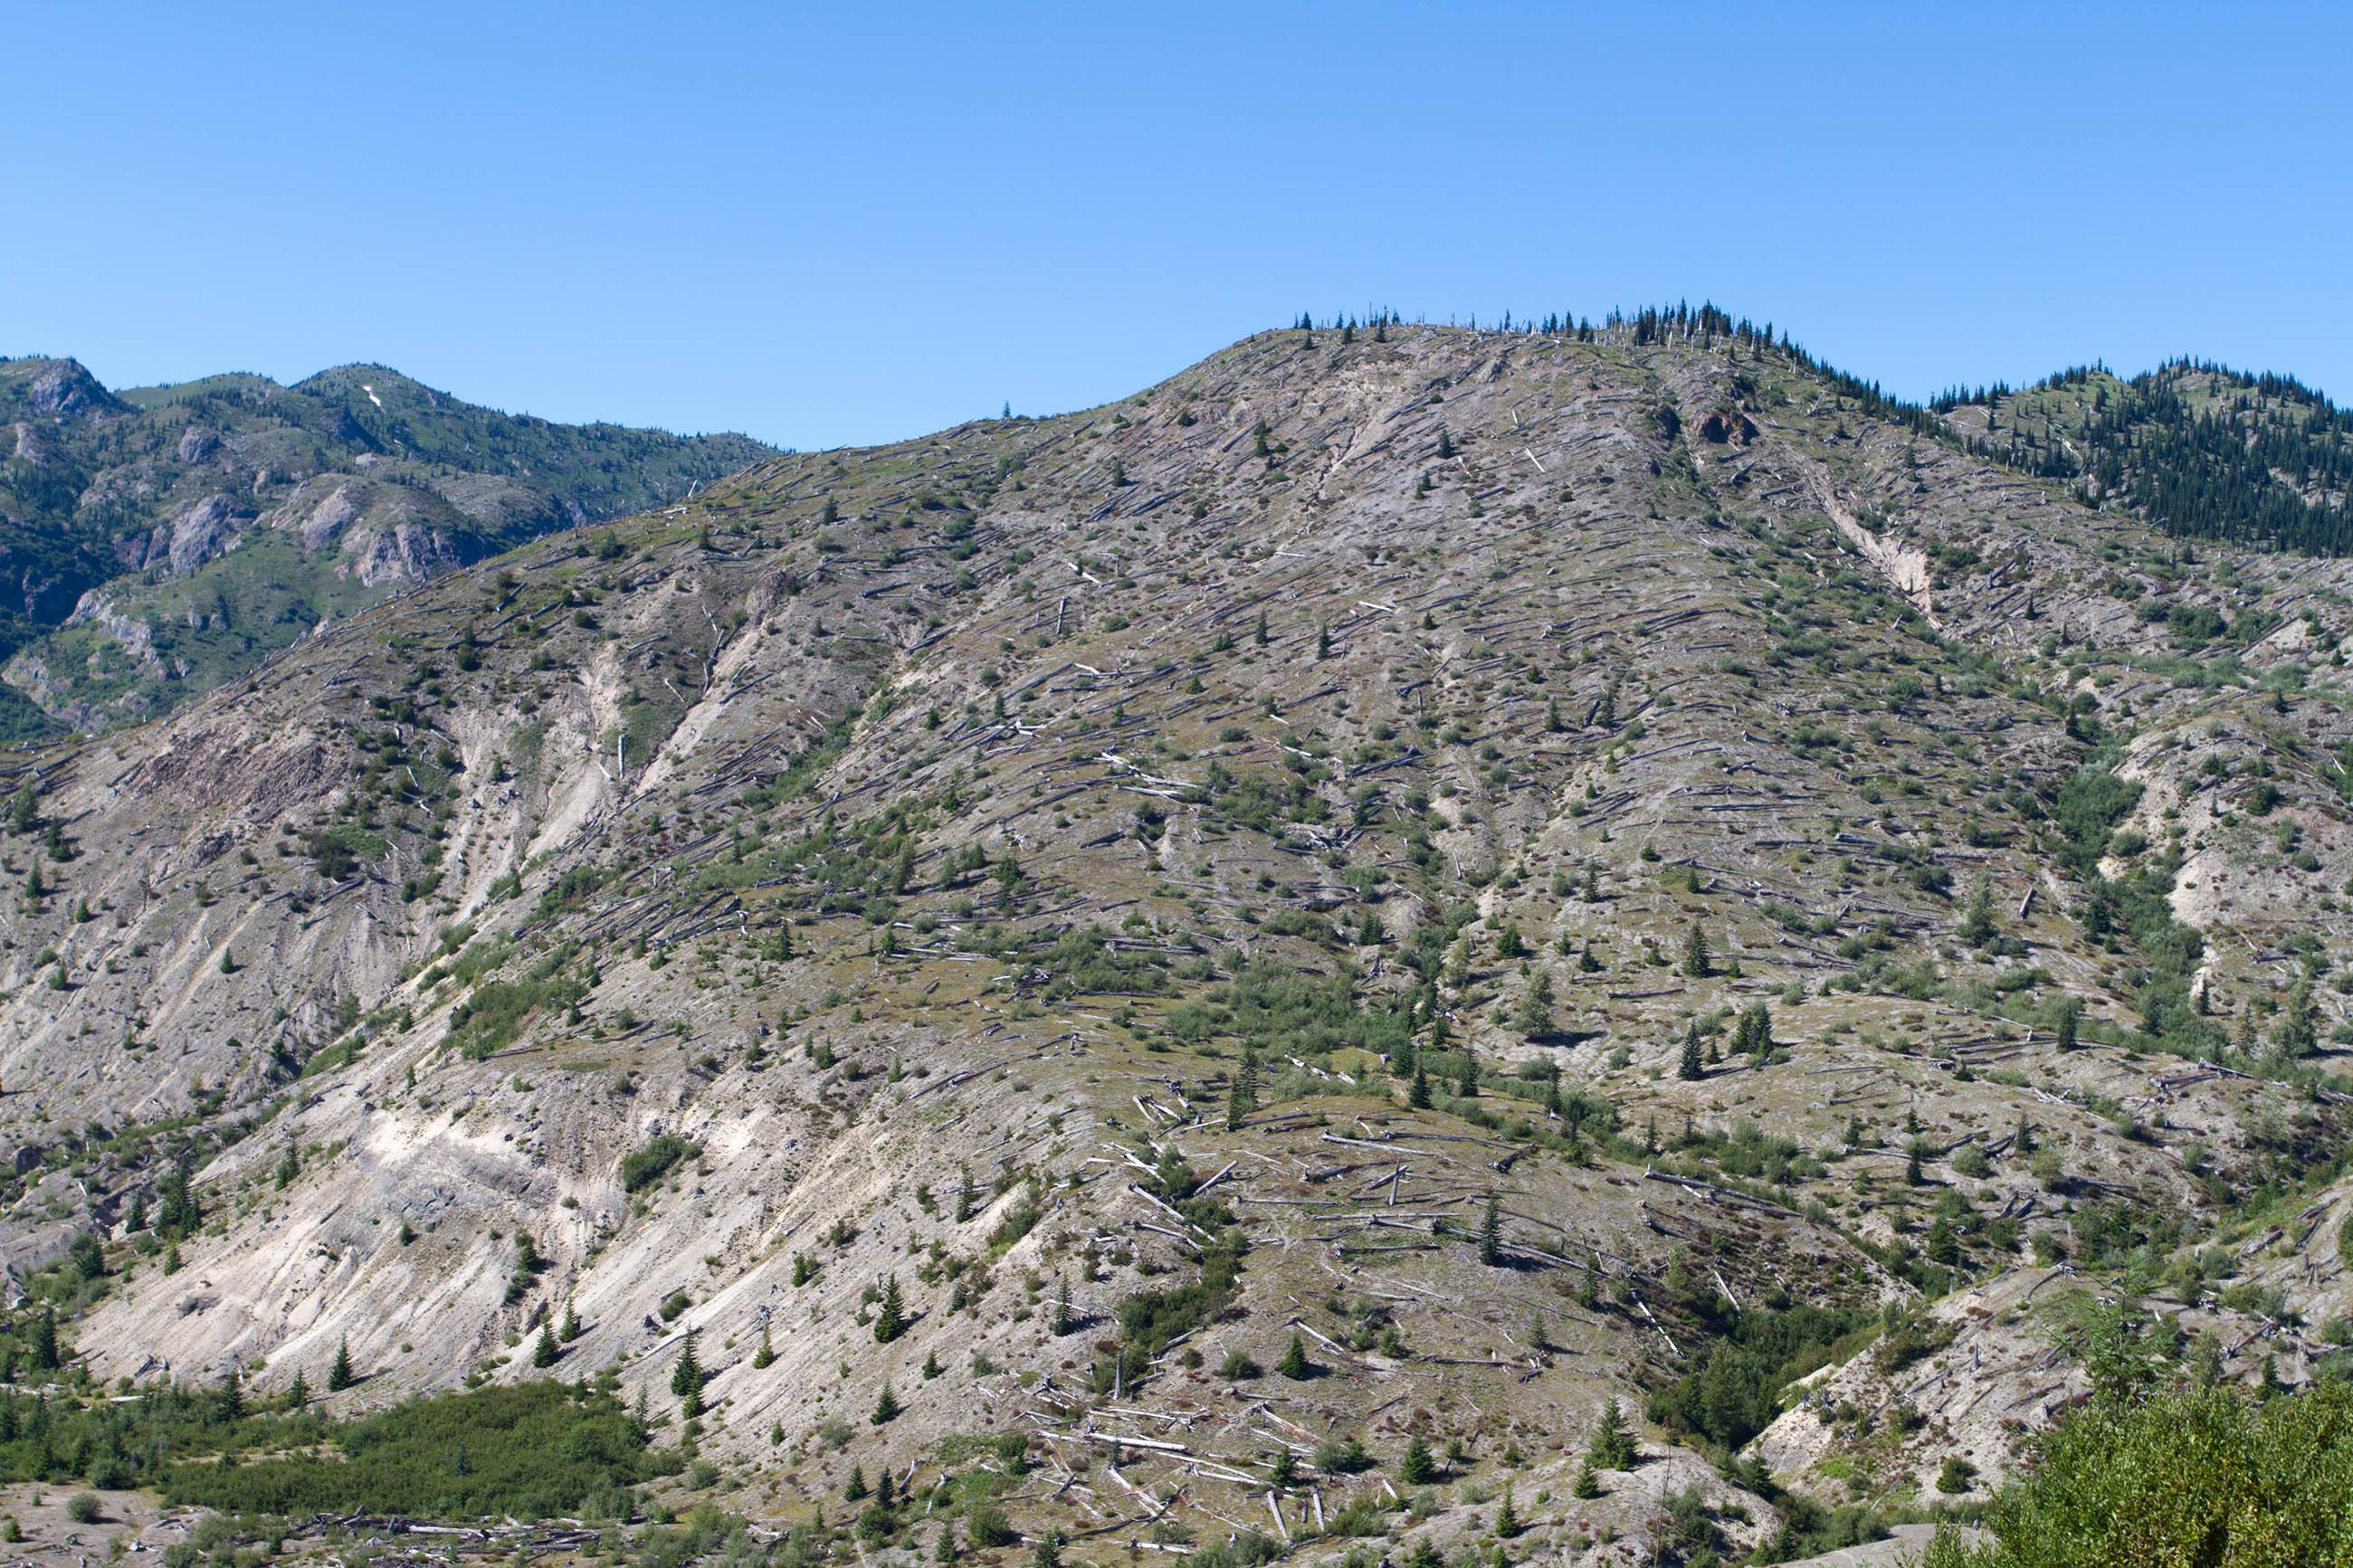 Mount saint helens photo